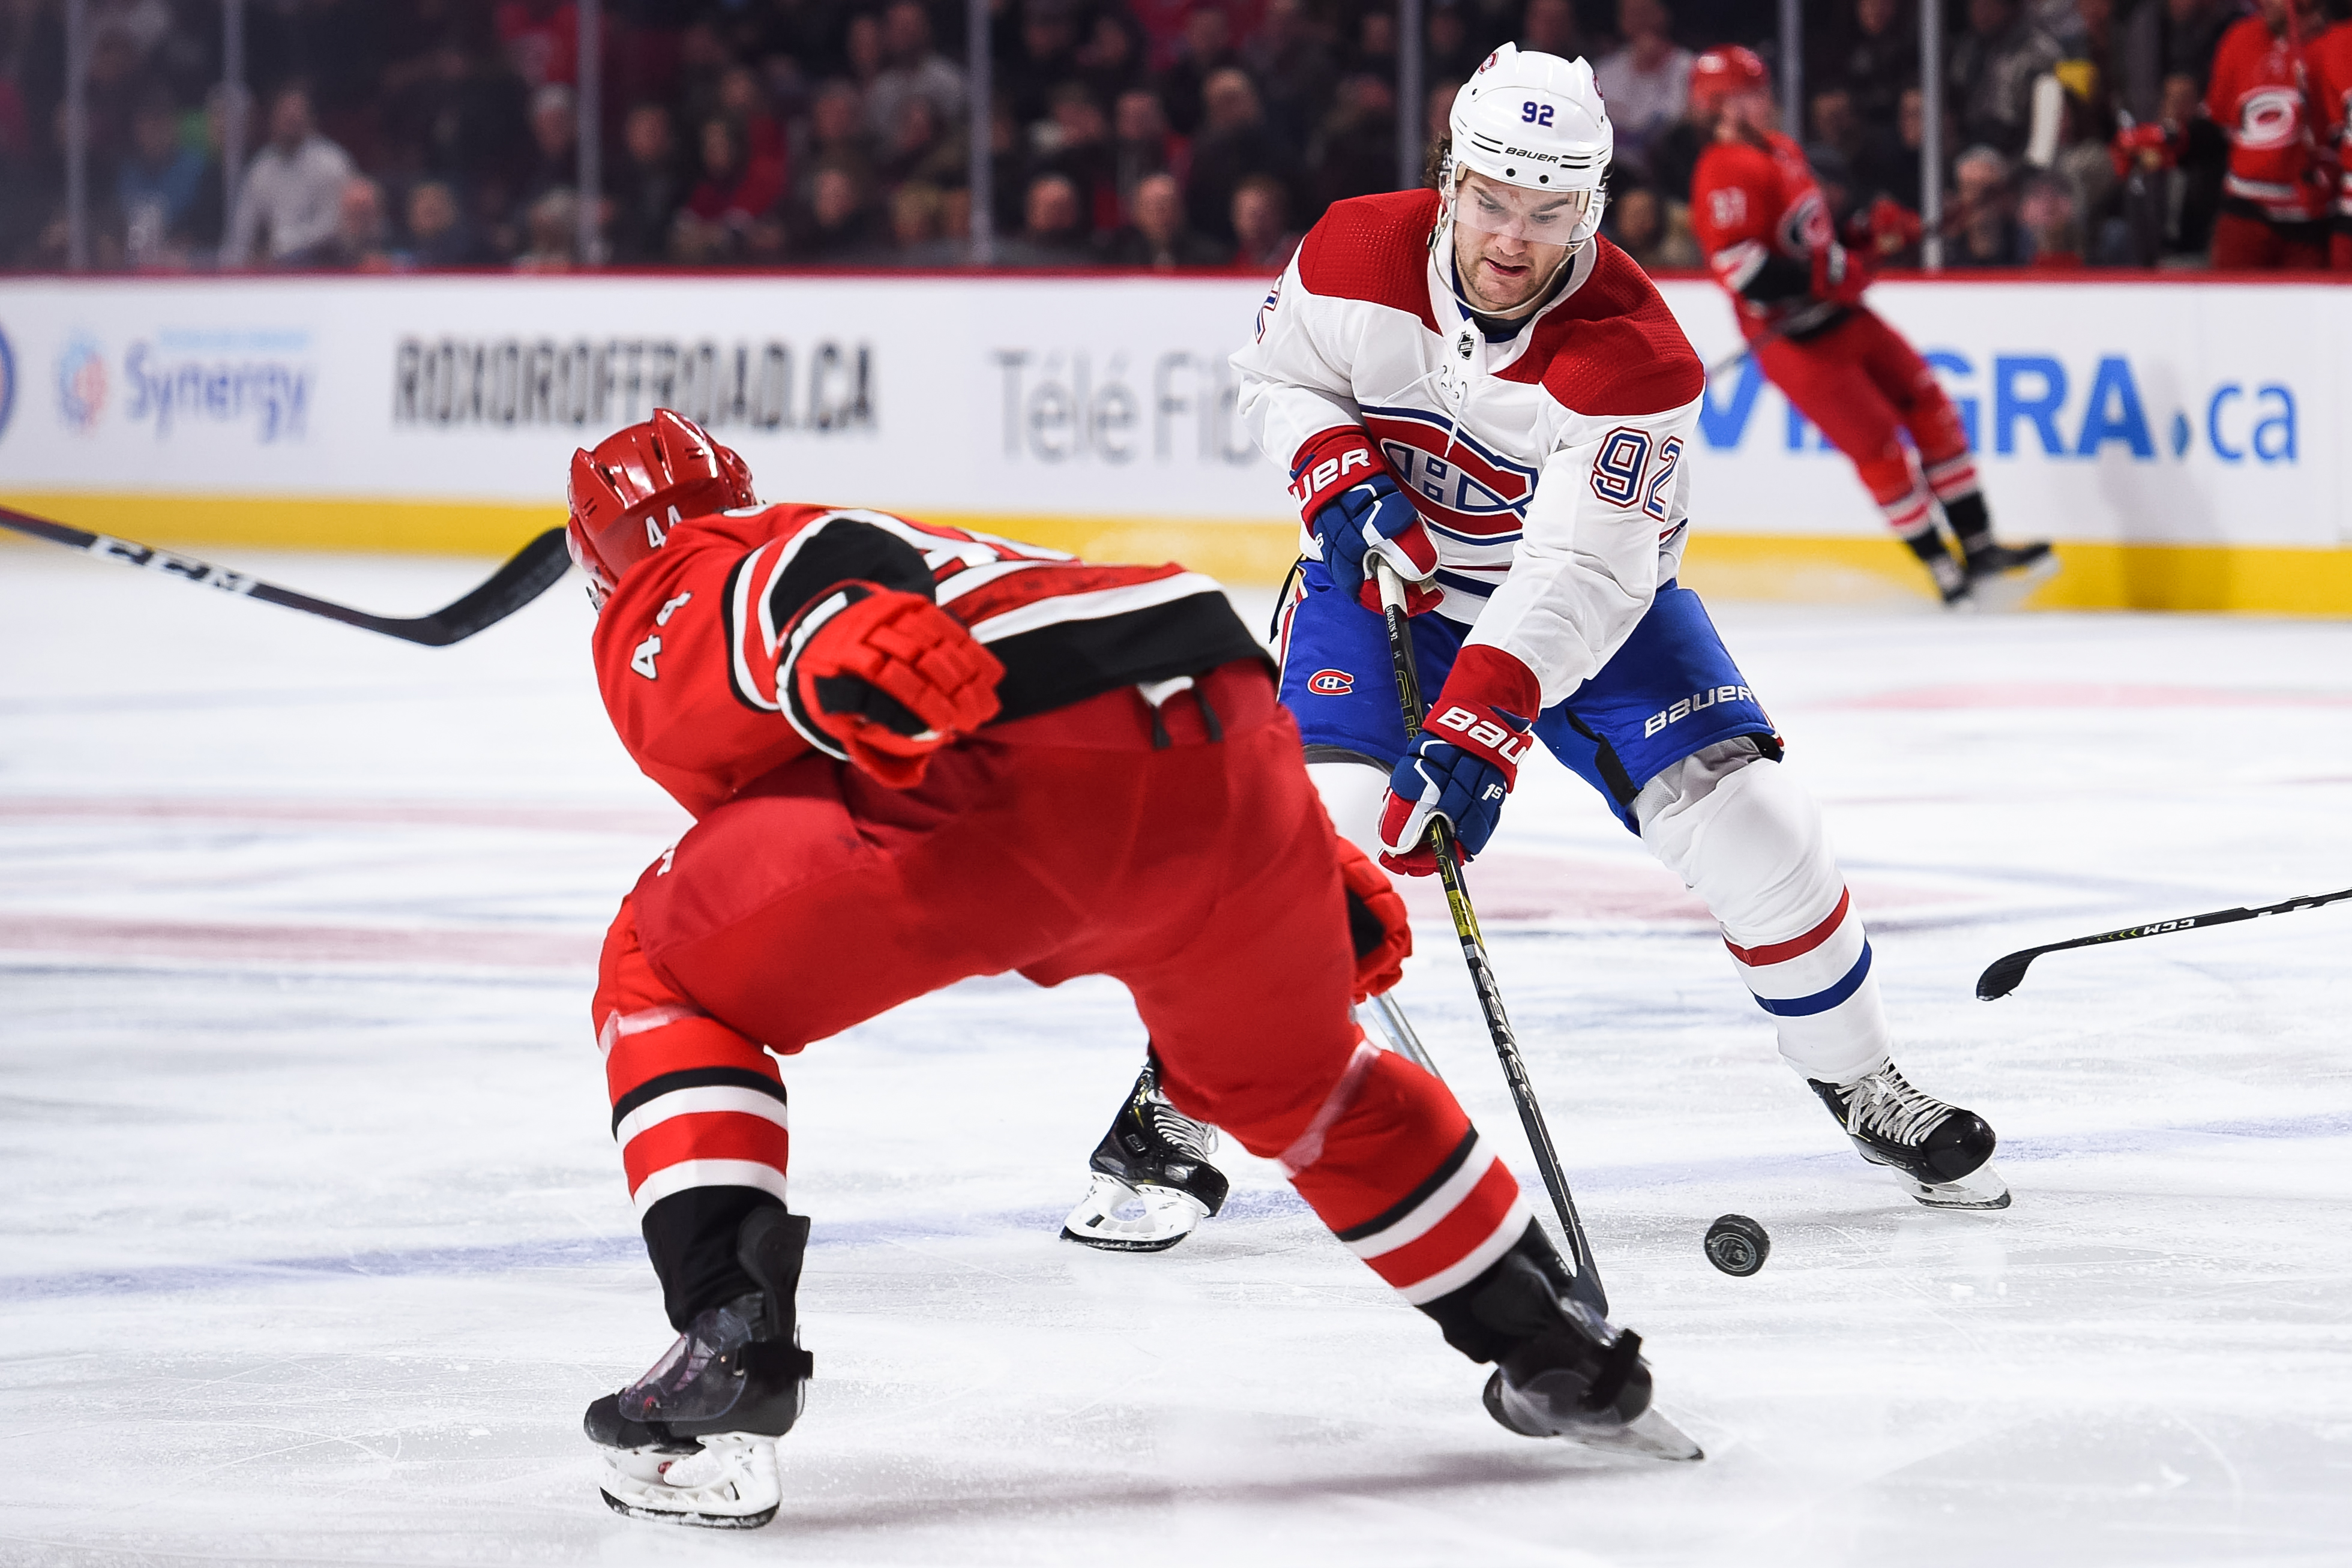 NHL: DEC 13 Hurricanes at Canadiens